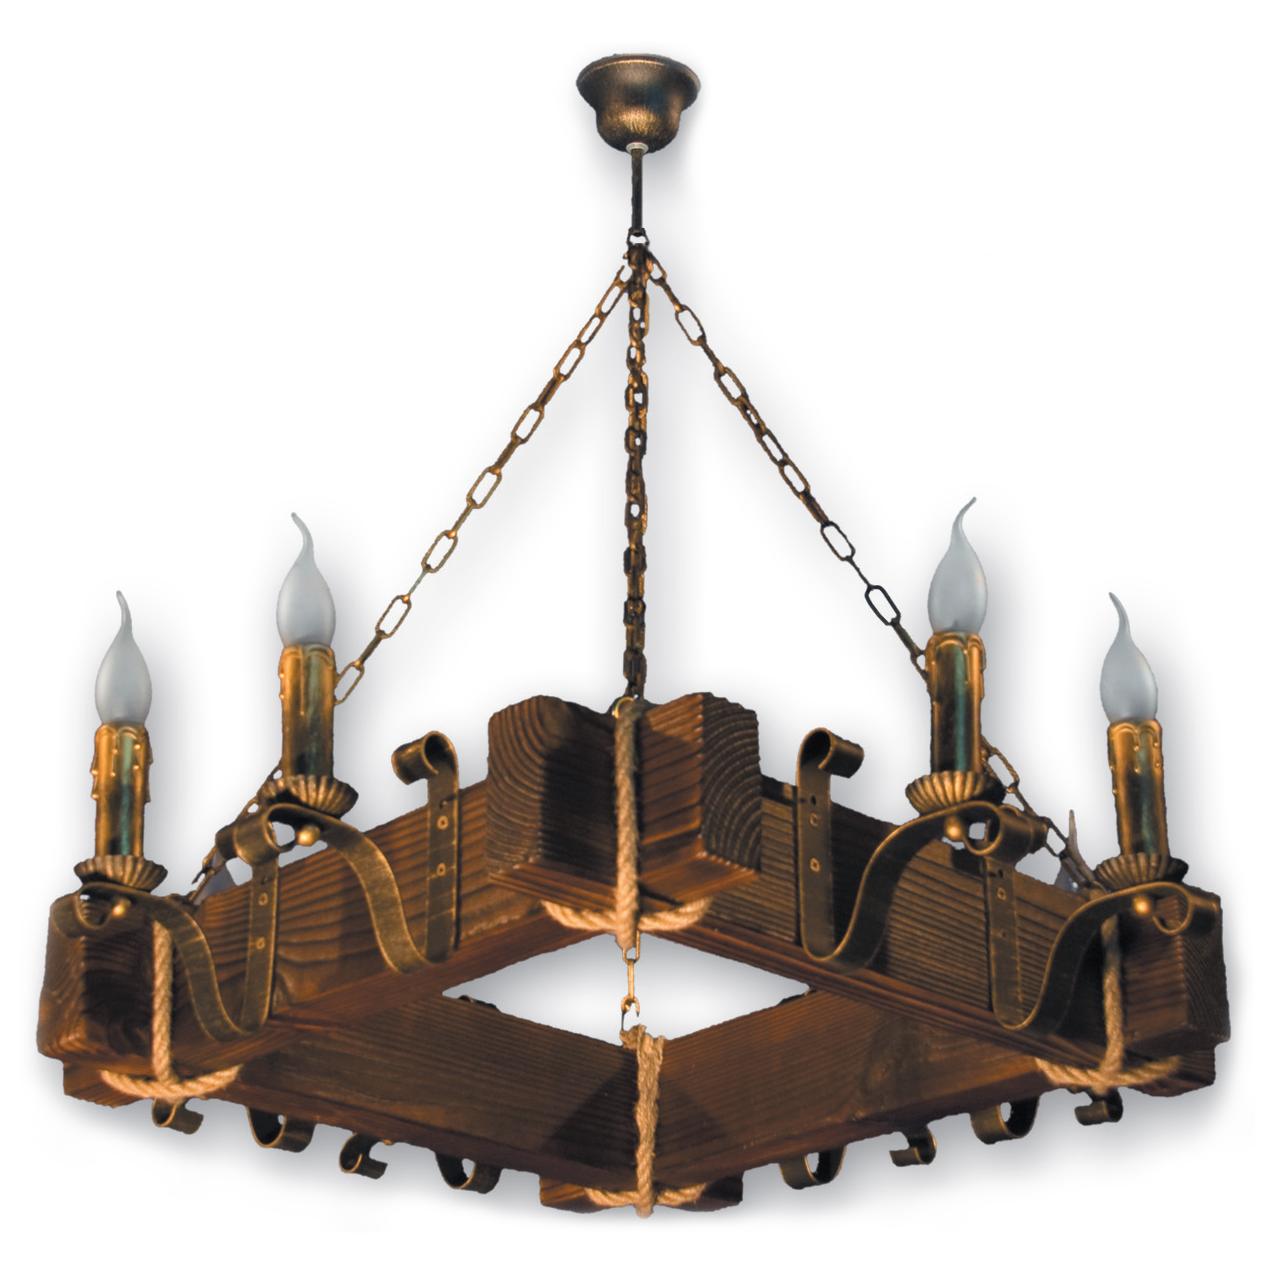 Люстра подвесная 8 свечей Е14 серии Lilia 230928